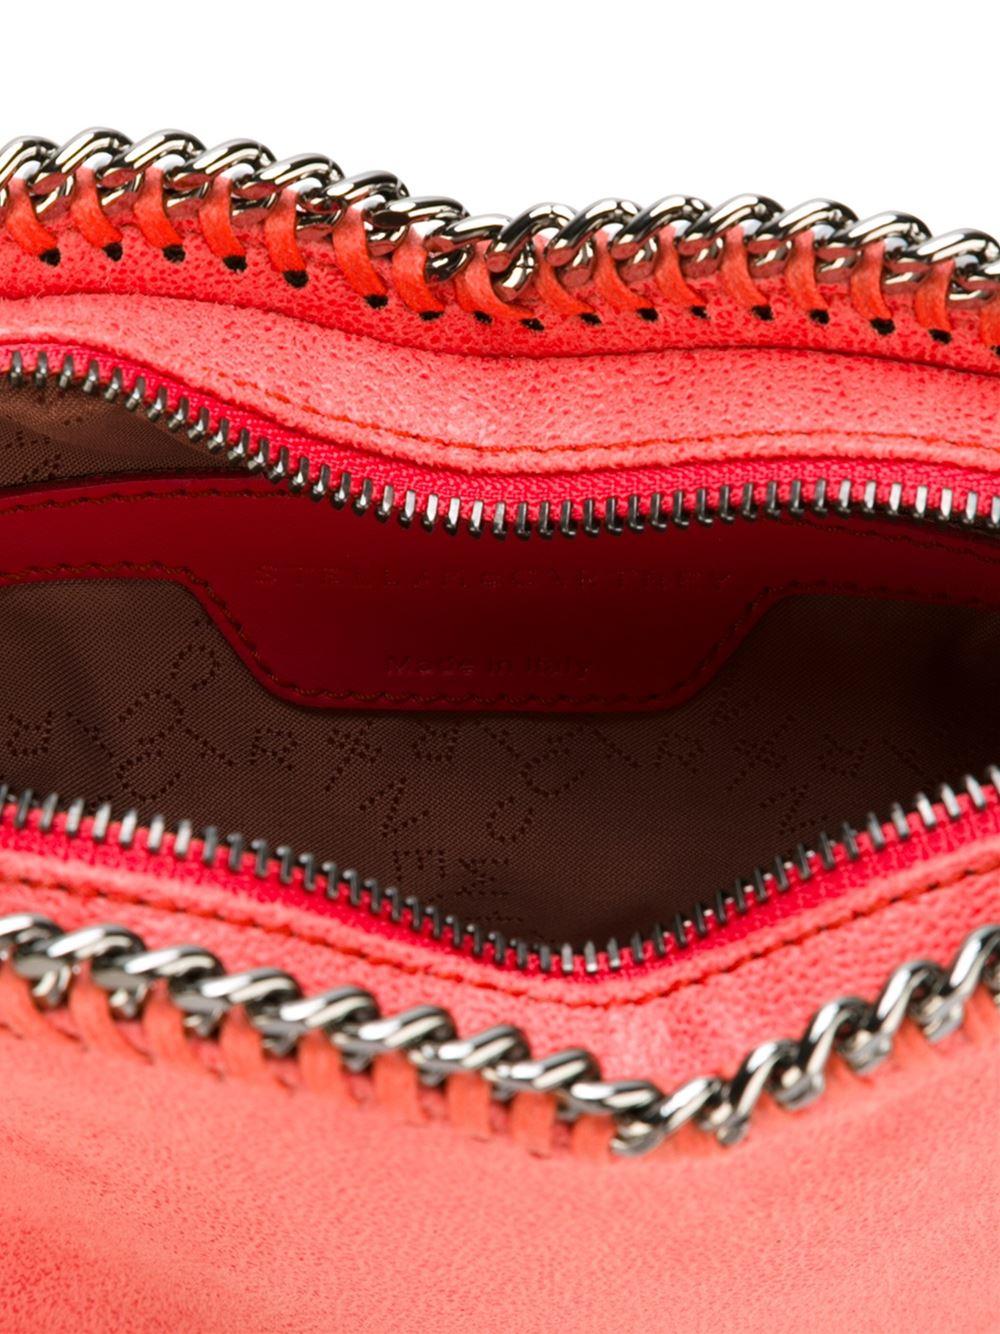 Stella McCartney Leather Falabella Heart Cross-body Bag in Pink